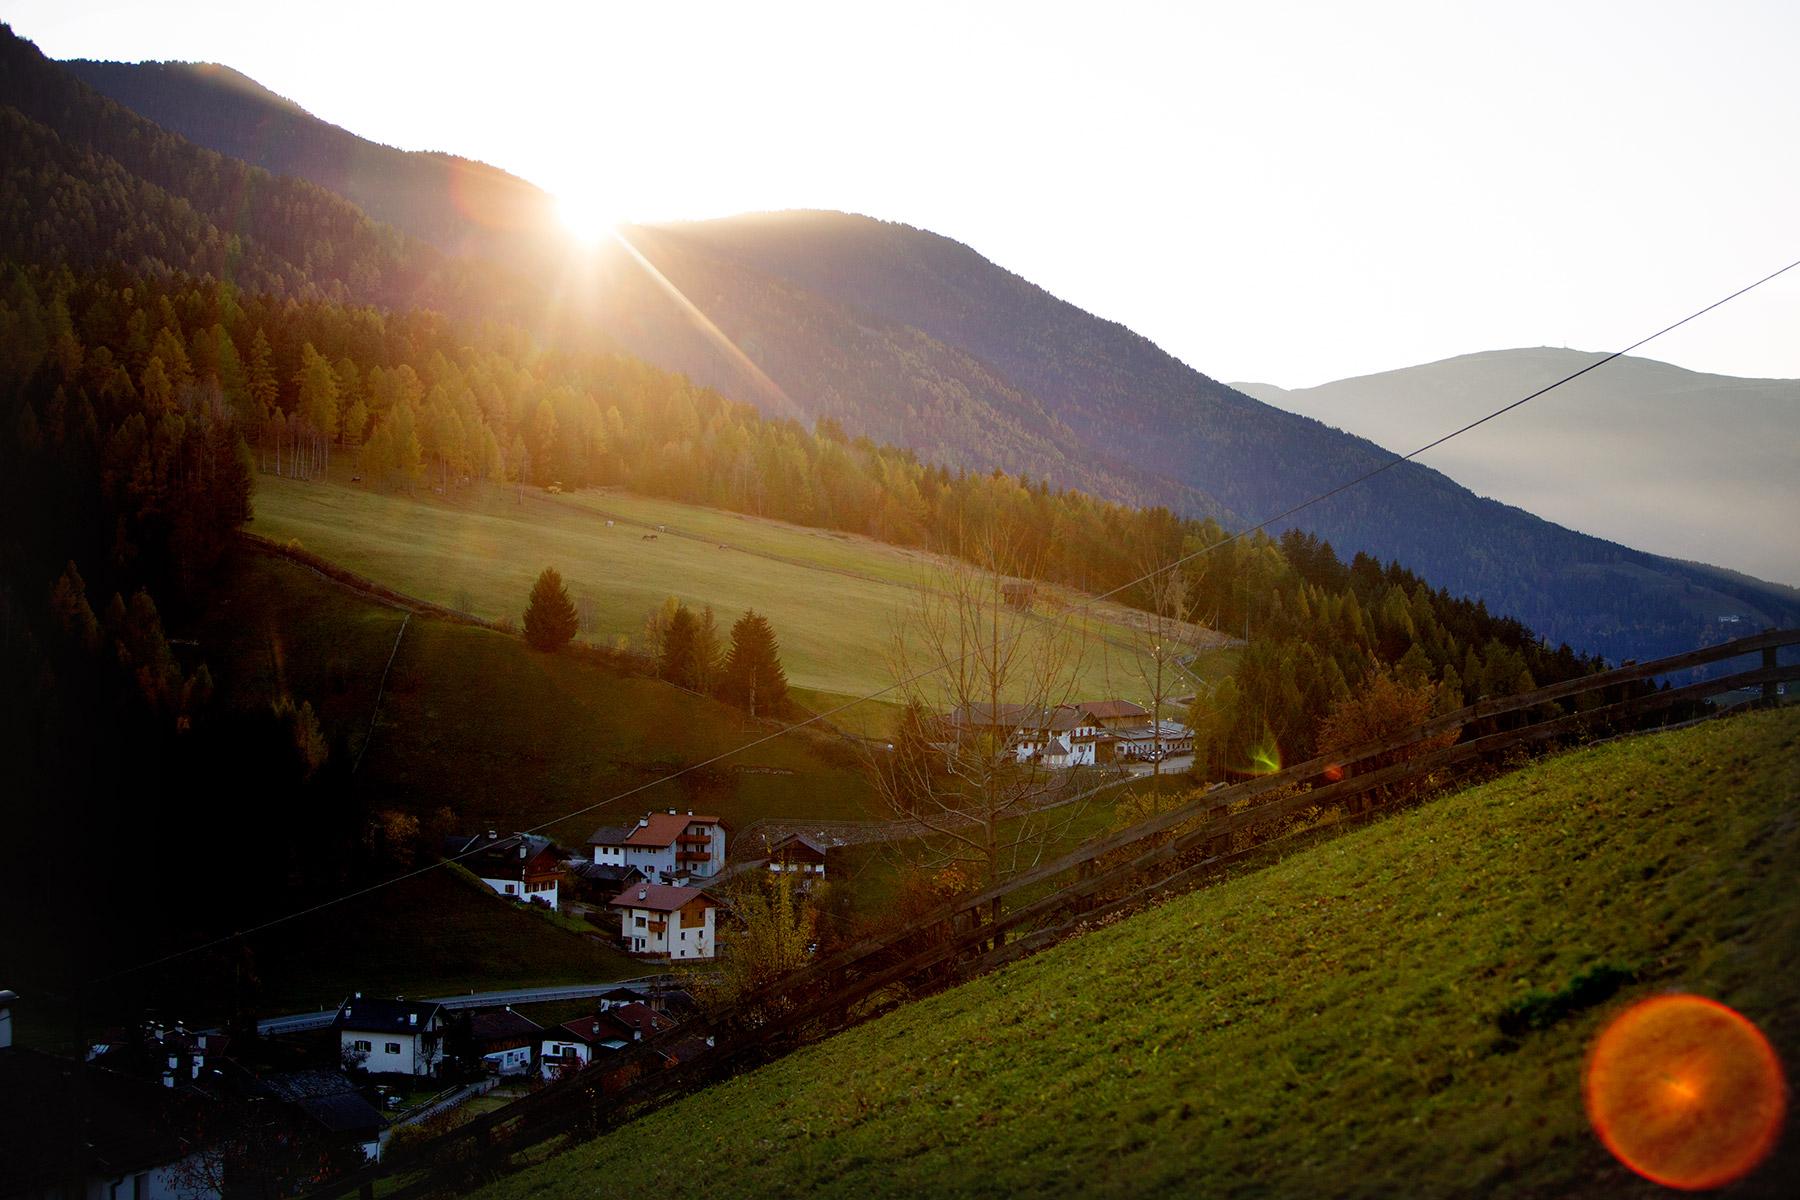 blogg-171026fallerhof18.jpg